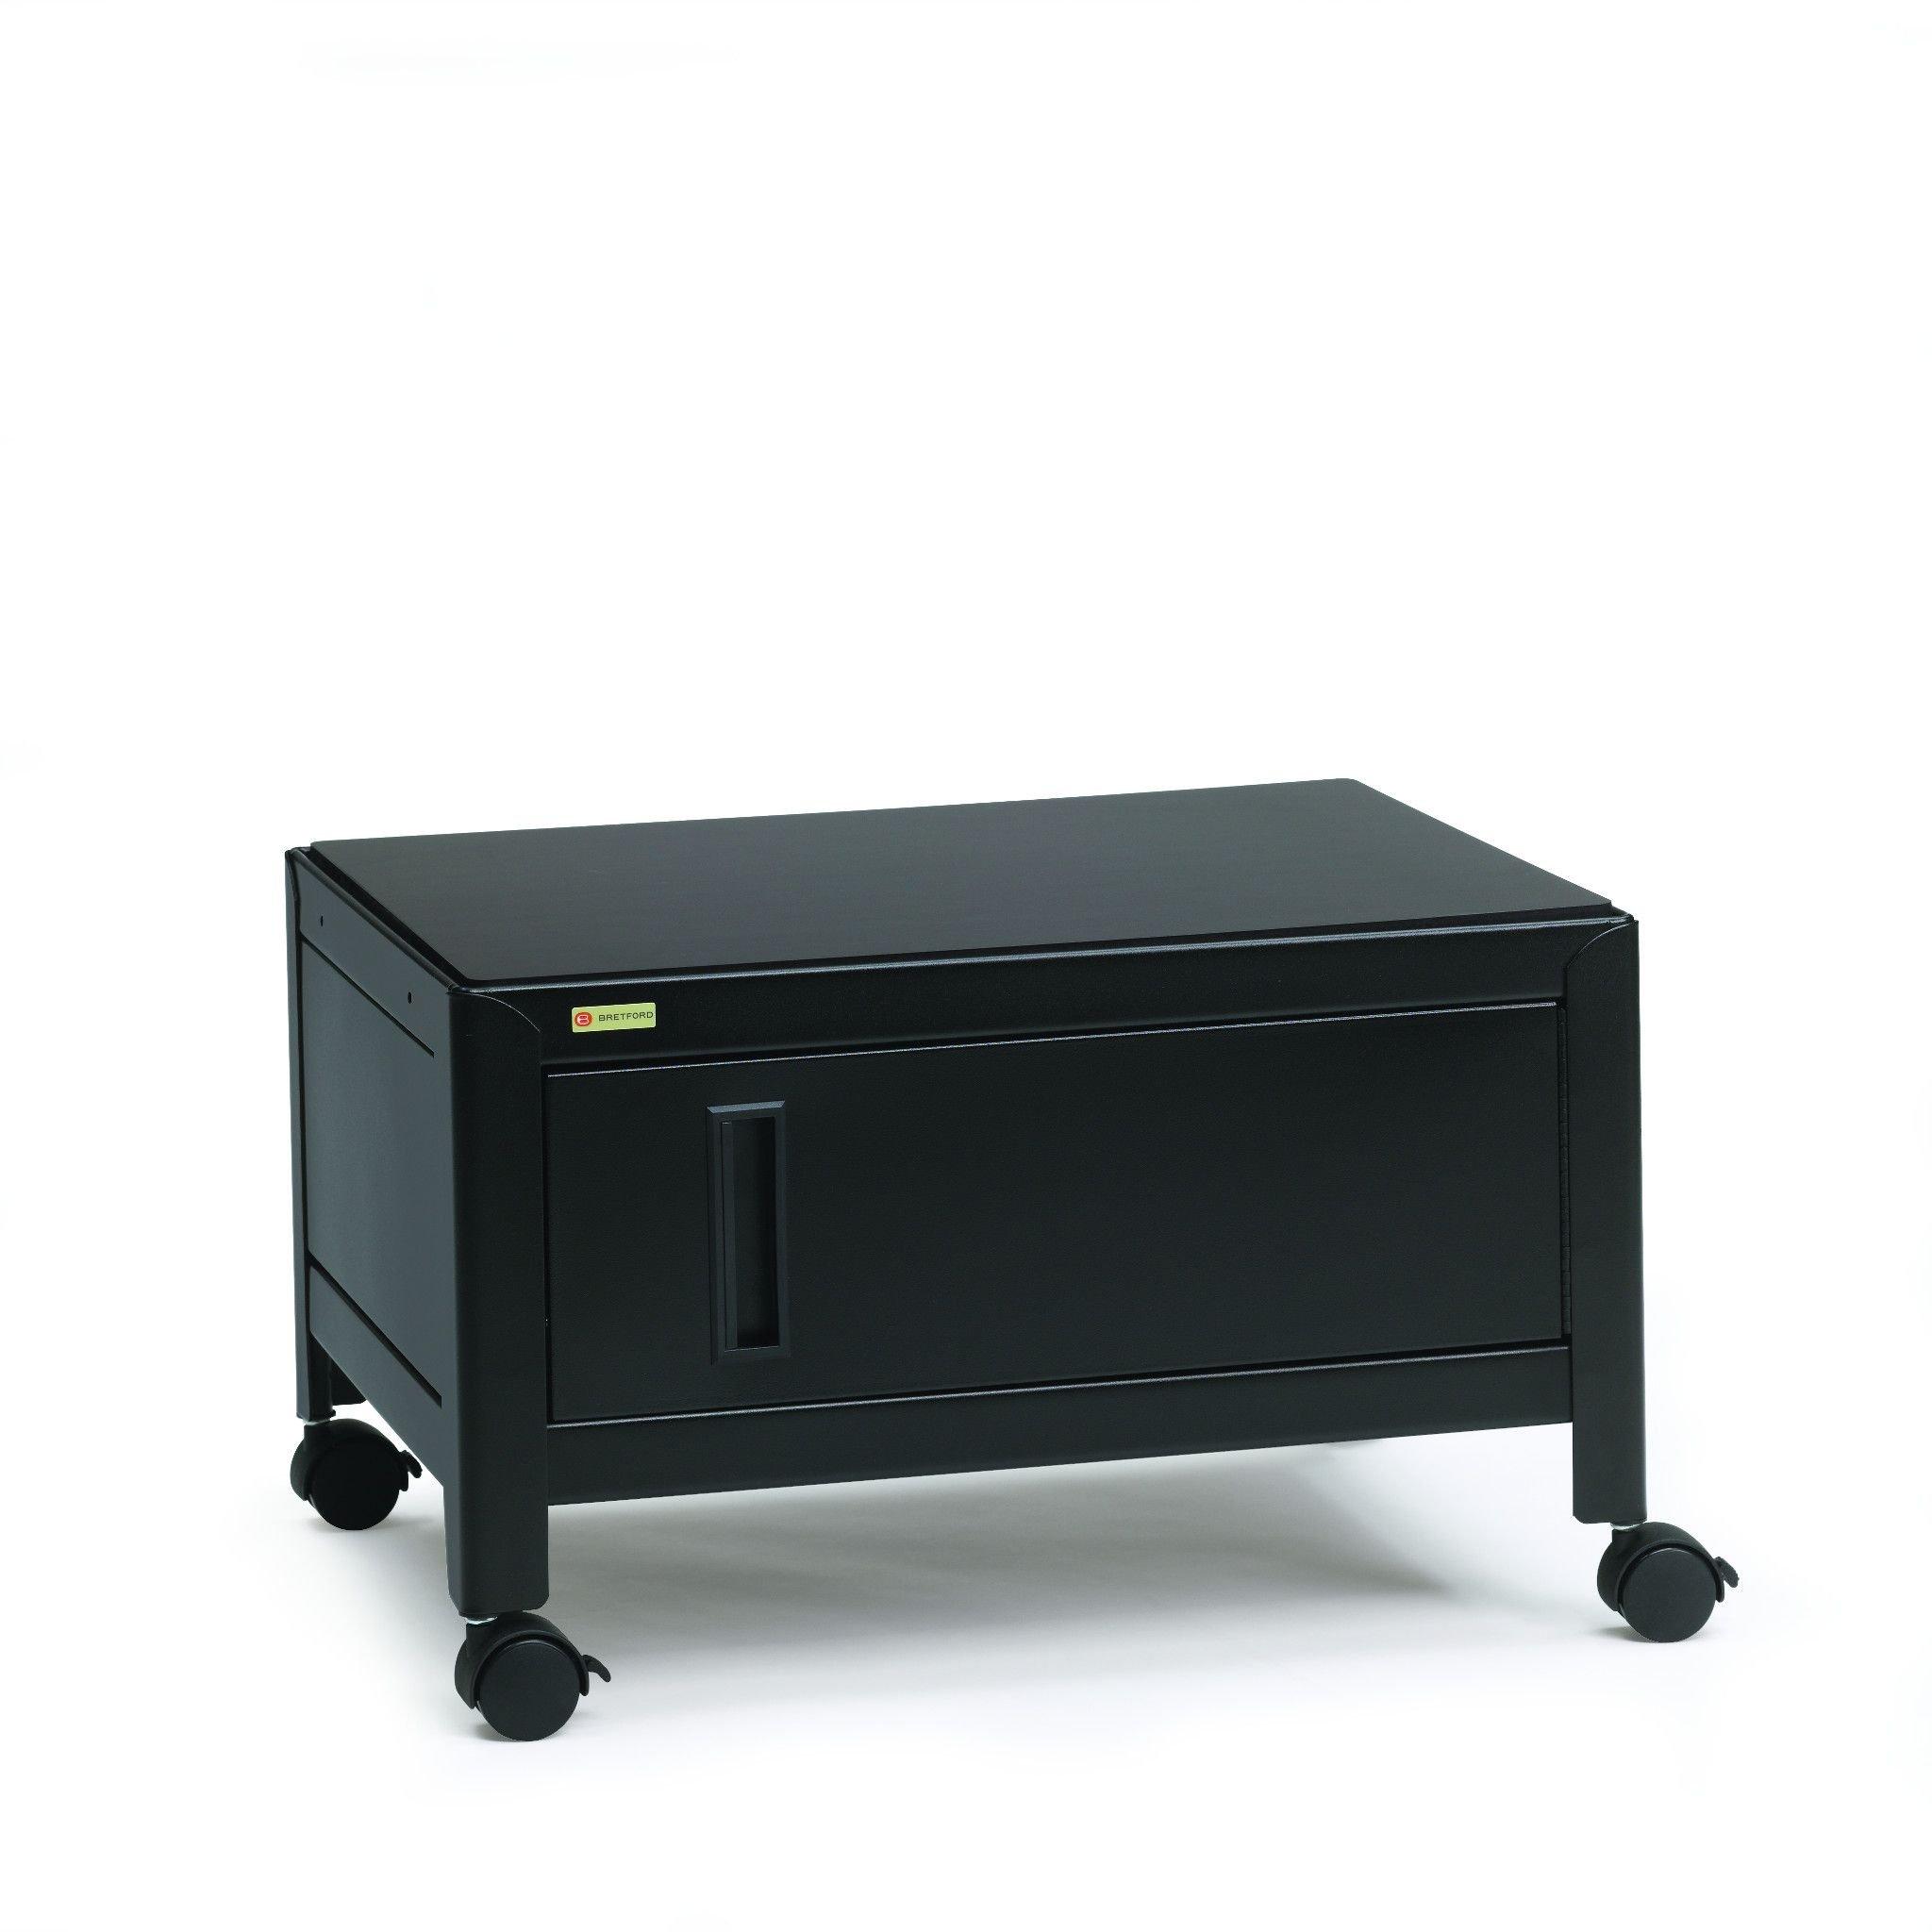 BREC15BK - Bretford C15-BK Tall Printer/Copier Stand